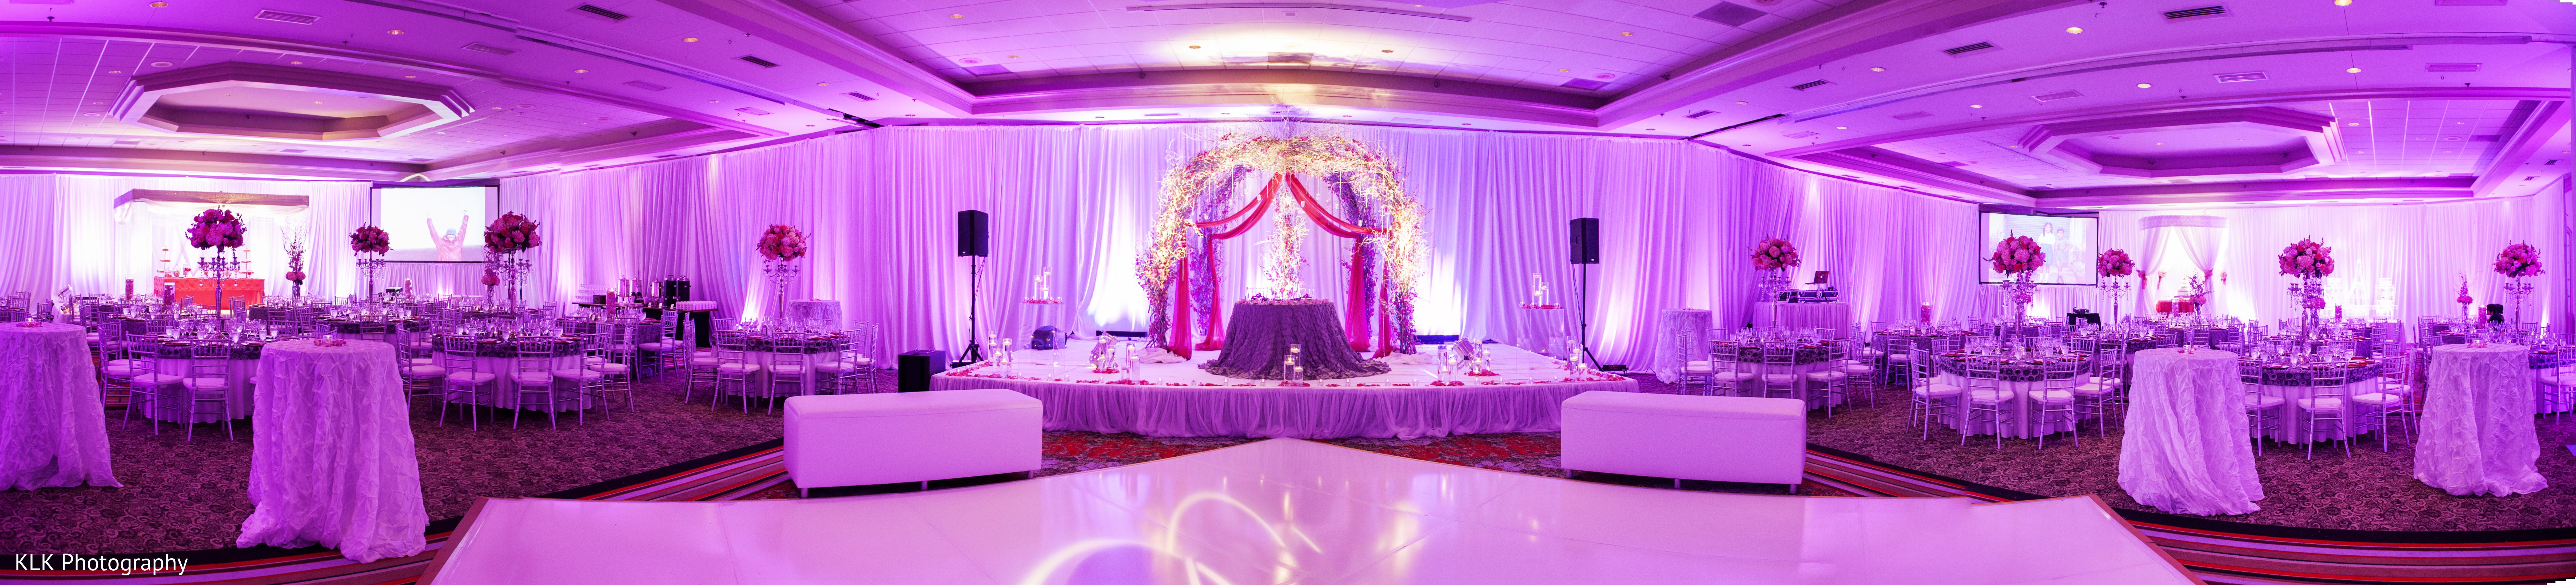 Tulsa, OK Indian Wedding by KLK Photography | Post #4275